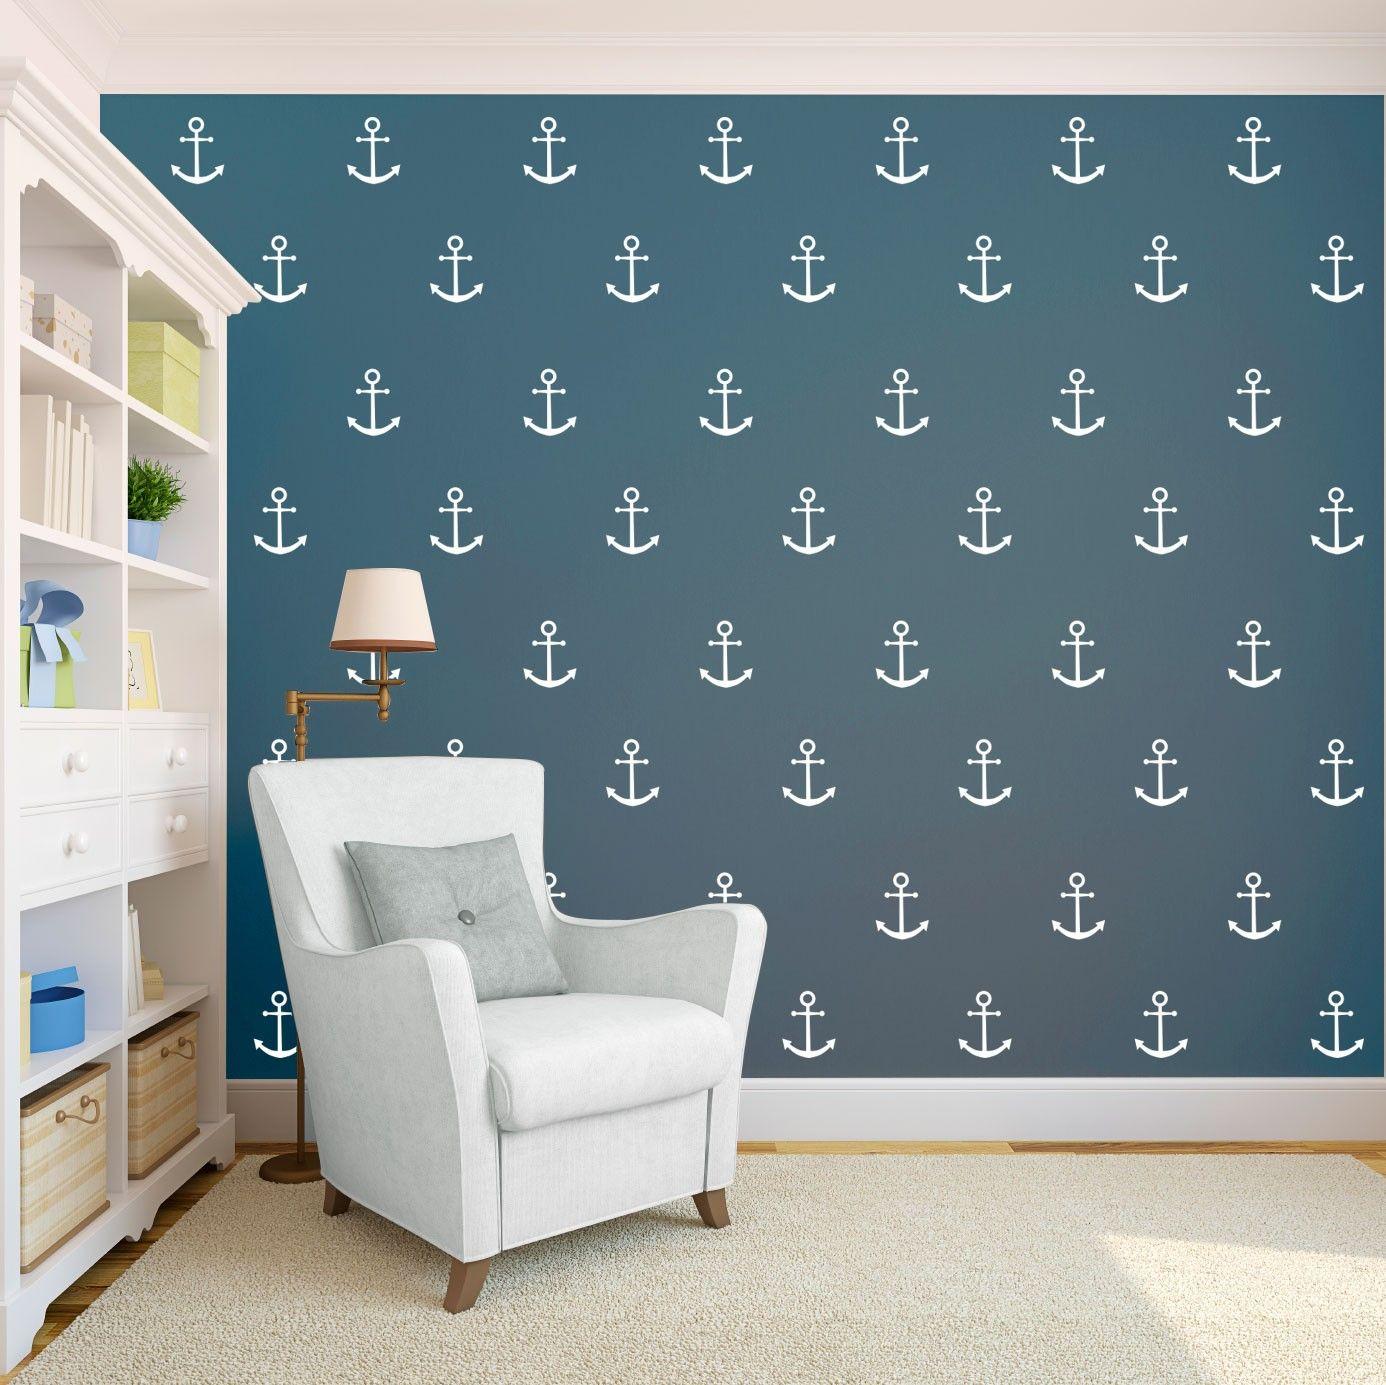 Anchor Pattern Wall Patterns Vinyl Wallpaper And Wallpaper - Custom vinyl wall decals removable